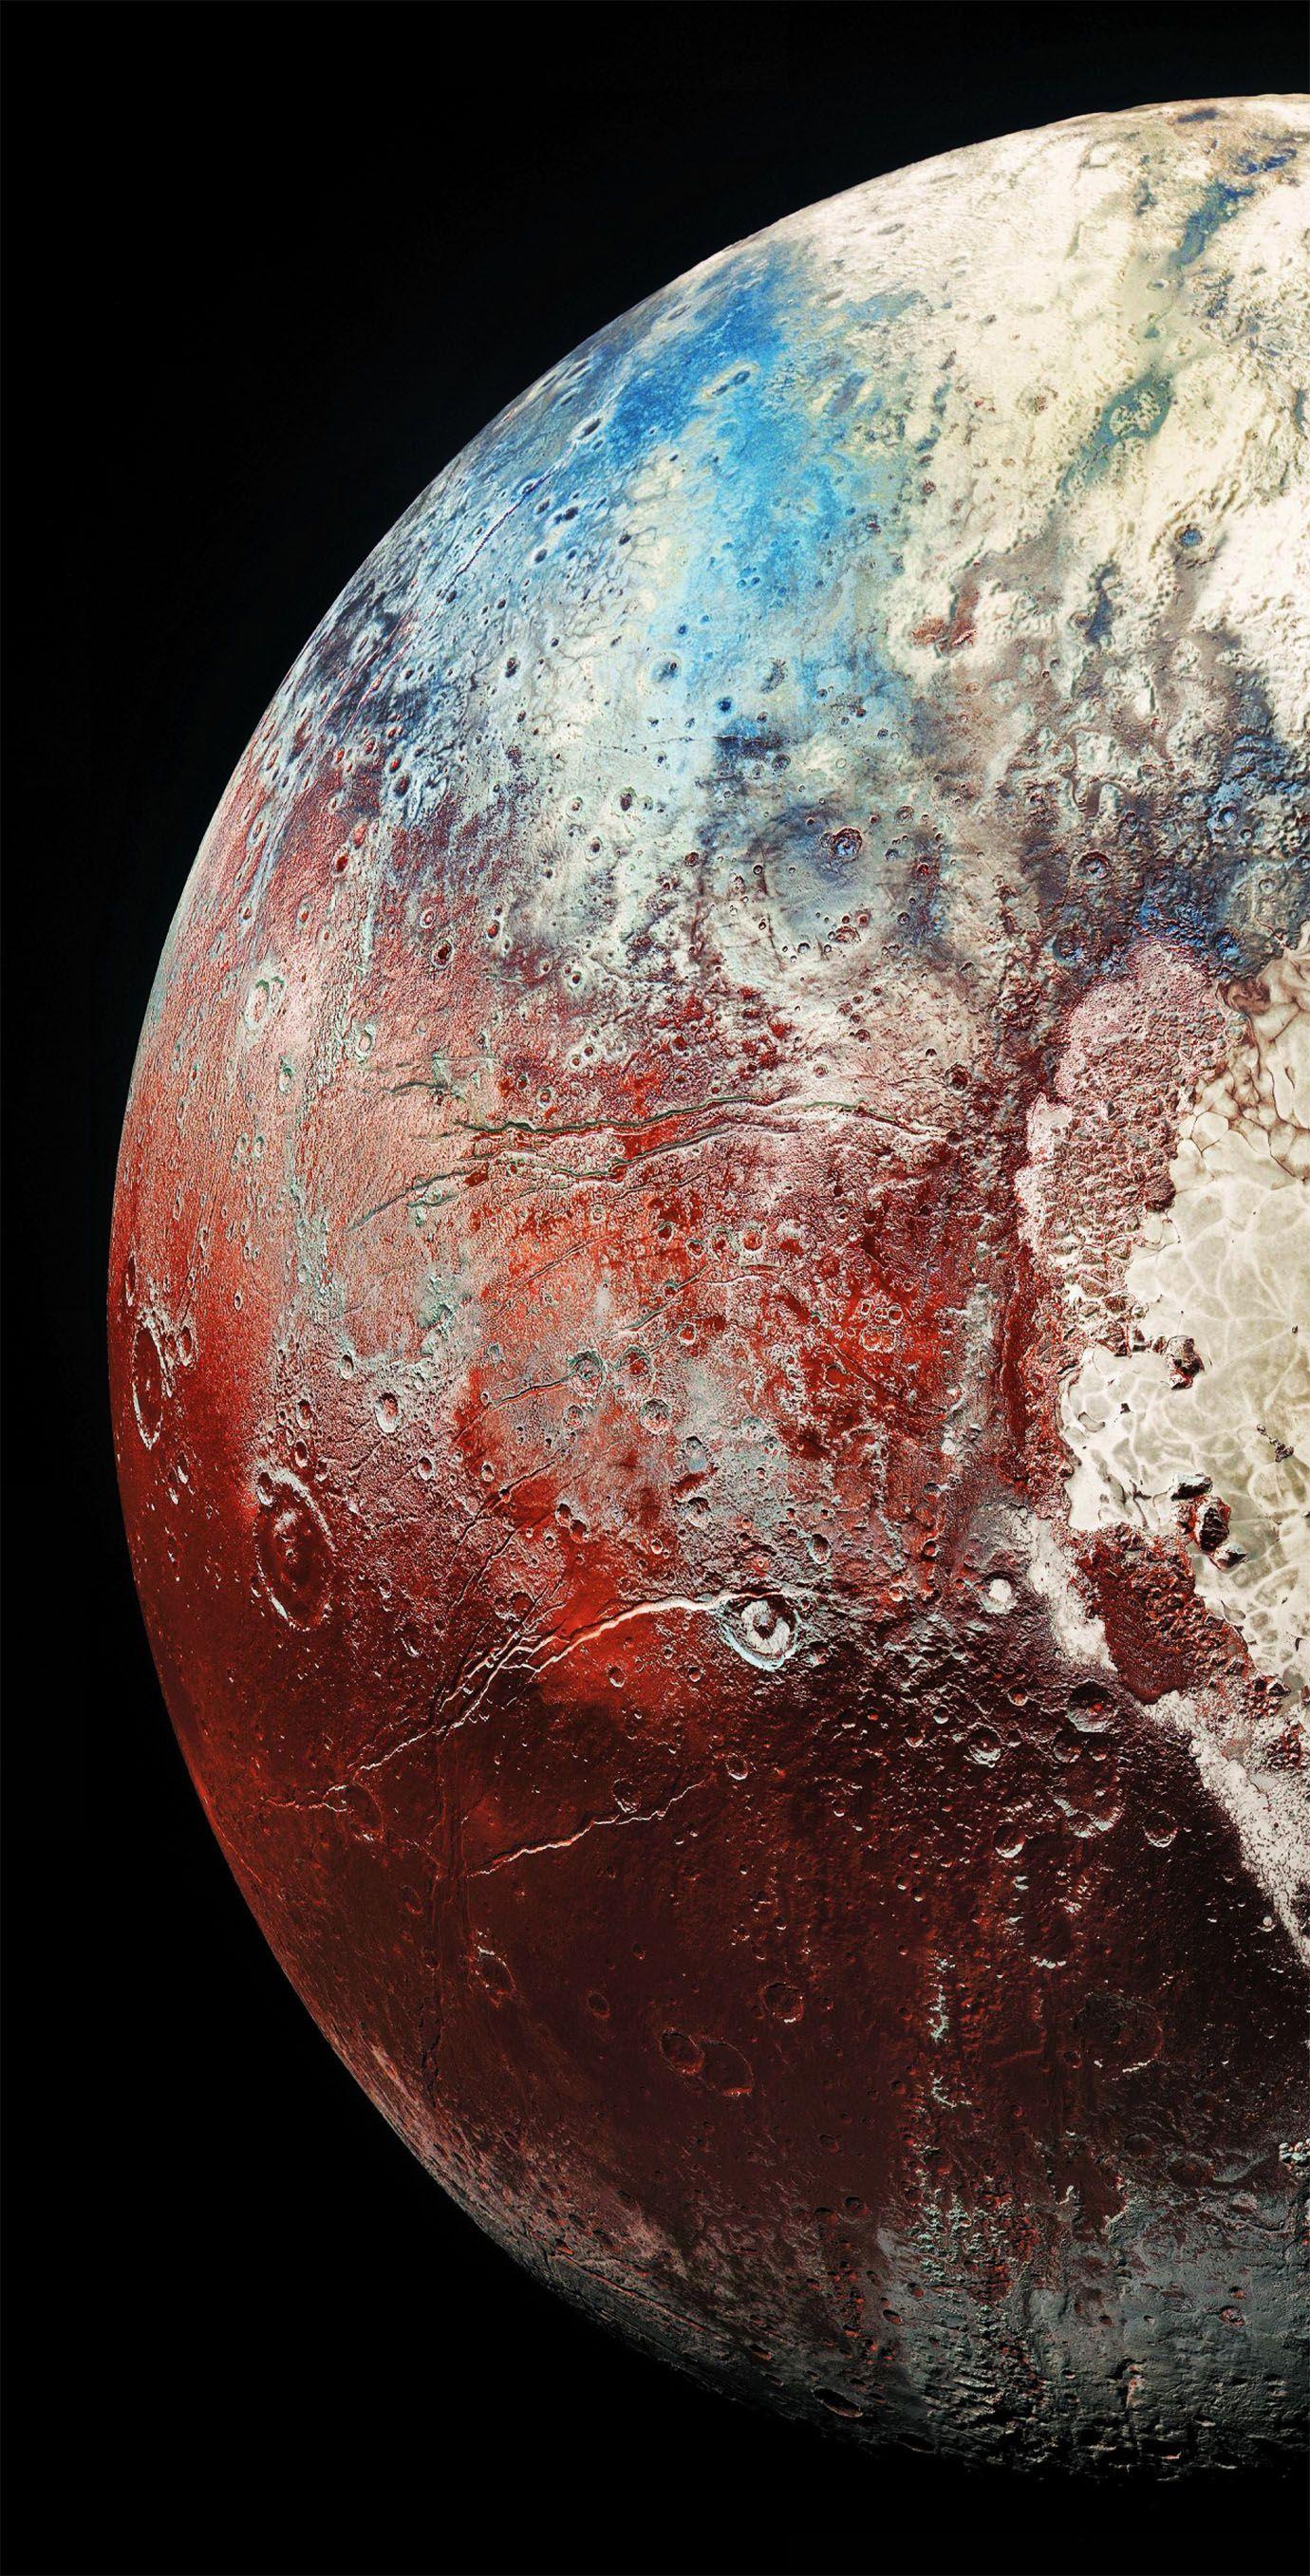 Photo of 【神秘】NASAが冥王星の最新画像を公開 / 鮮明で神秘的な未知の世界「太陽系外惑星へ拠点として役立つ宇宙港となる」 | バズプラスニュース